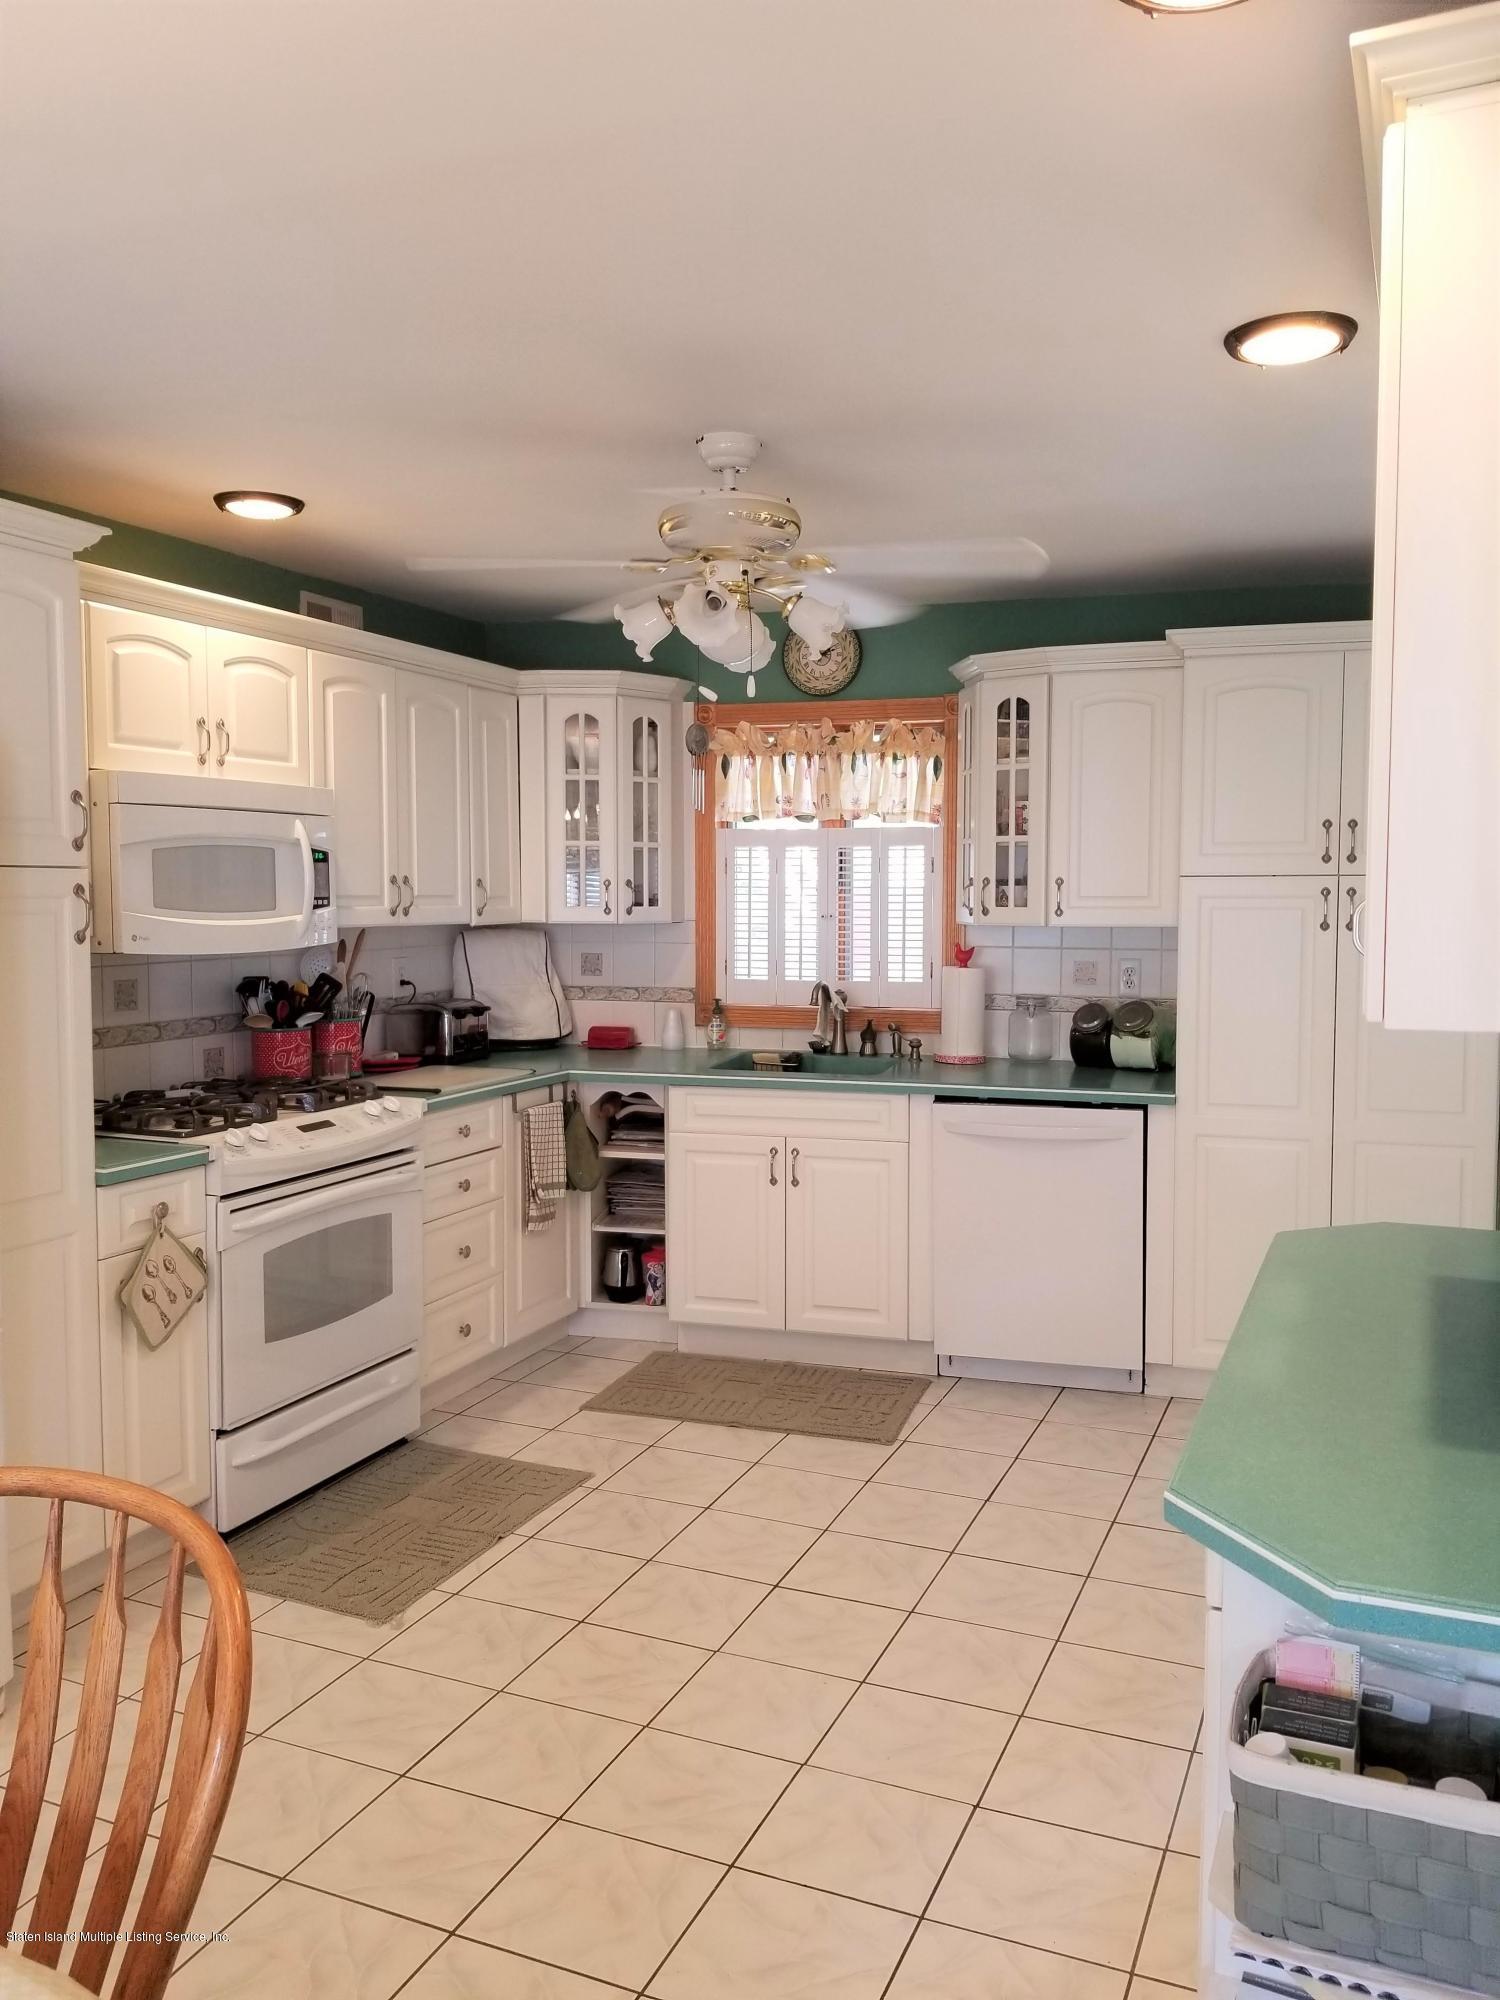 Single Family - Detached 273 Brighton Street  Staten Island, NY 10307, MLS-1131789-4